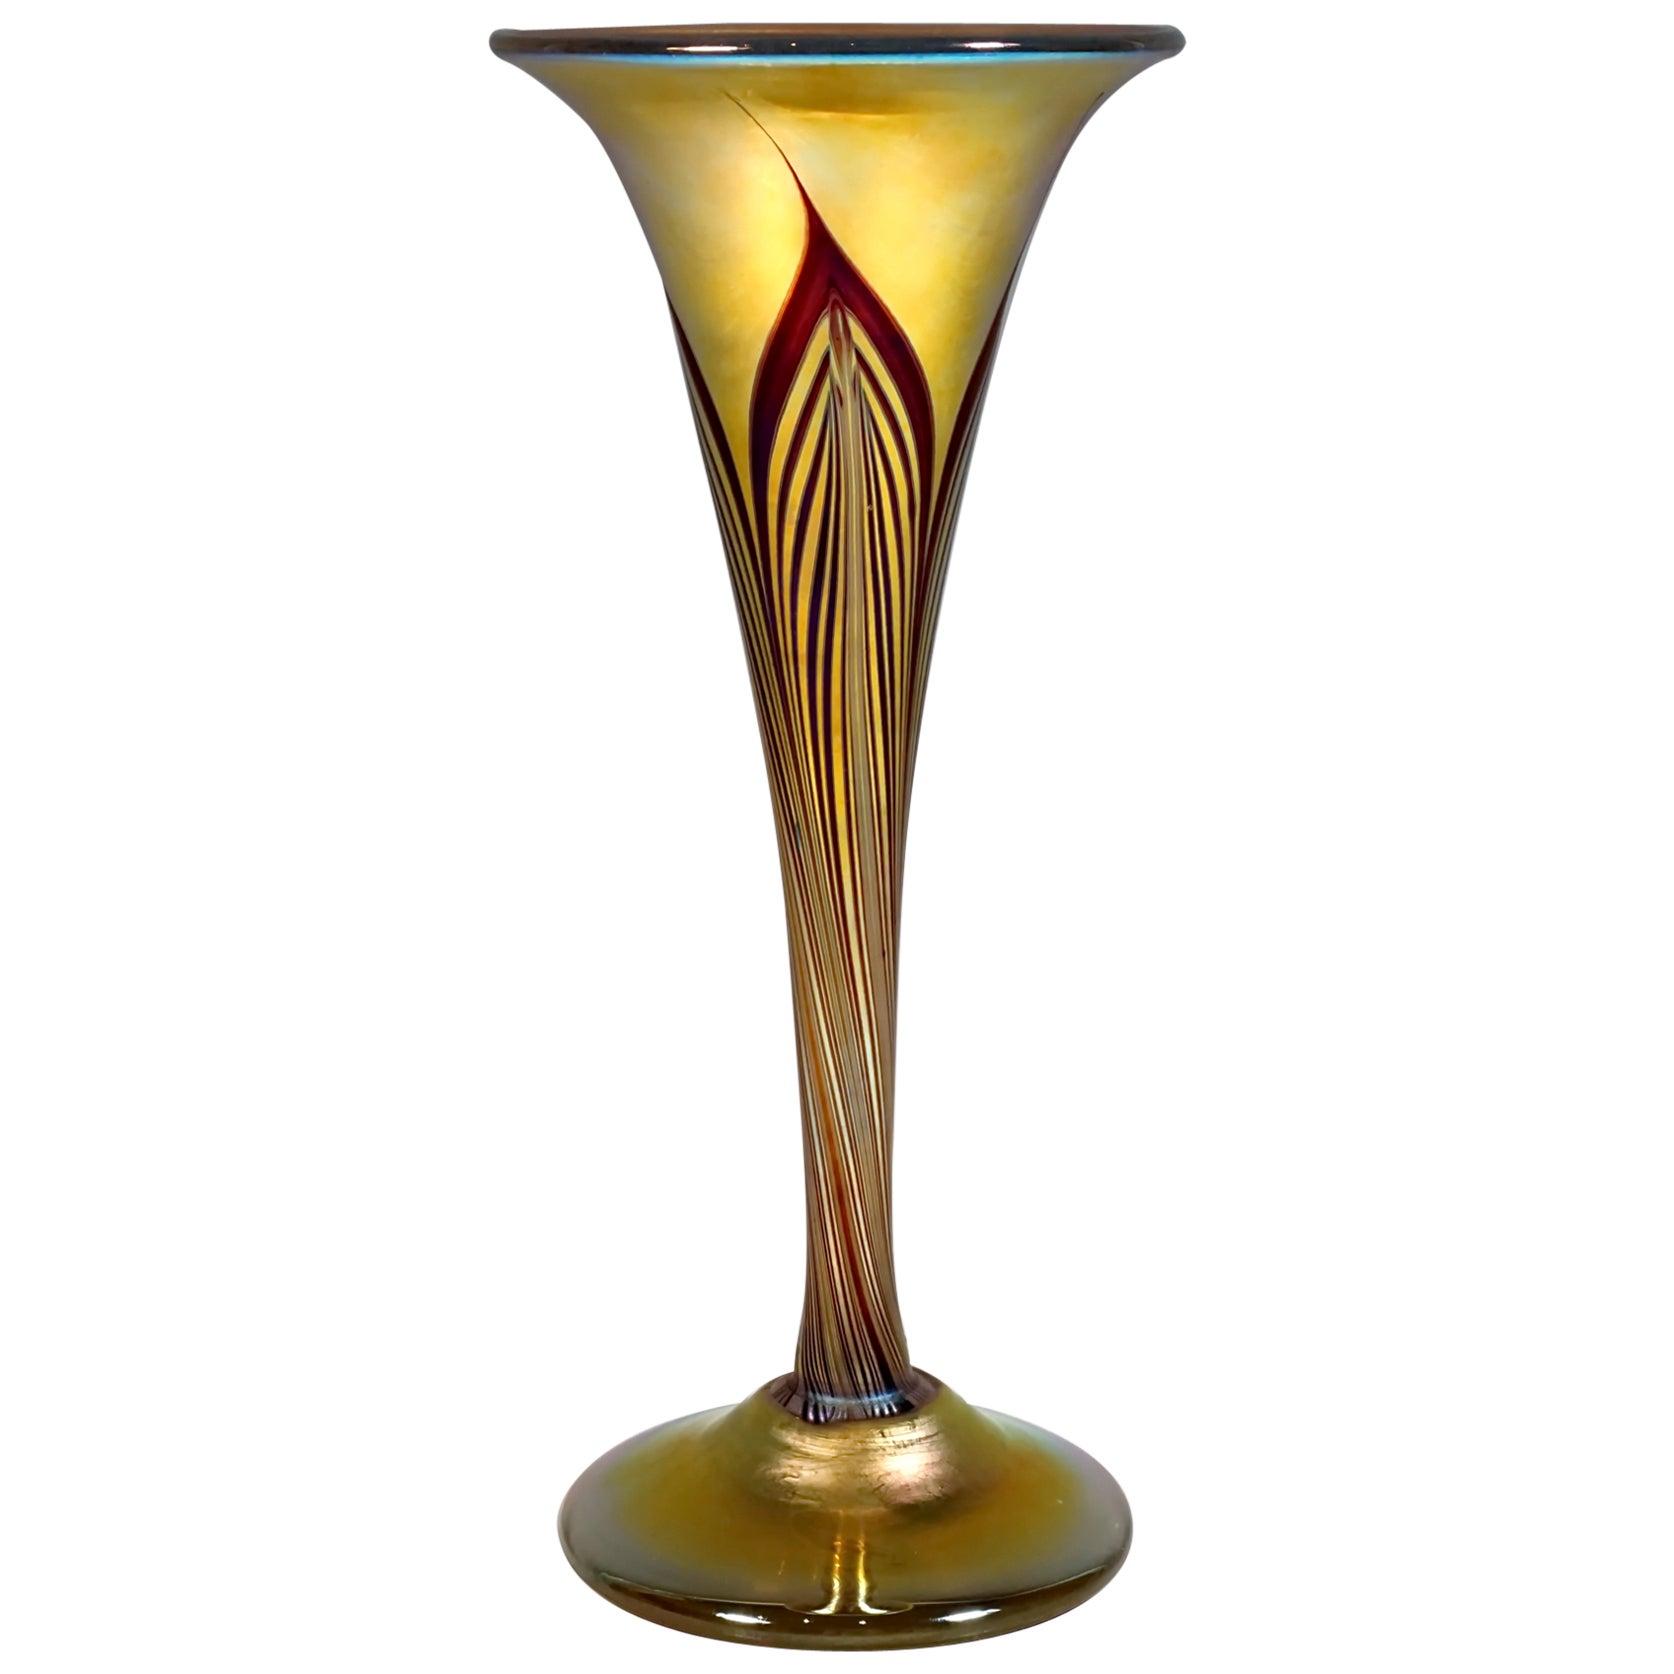 Art Nouveau Gold Favrile Glass Vase, L.C. Tiffany, New York, Around 1896